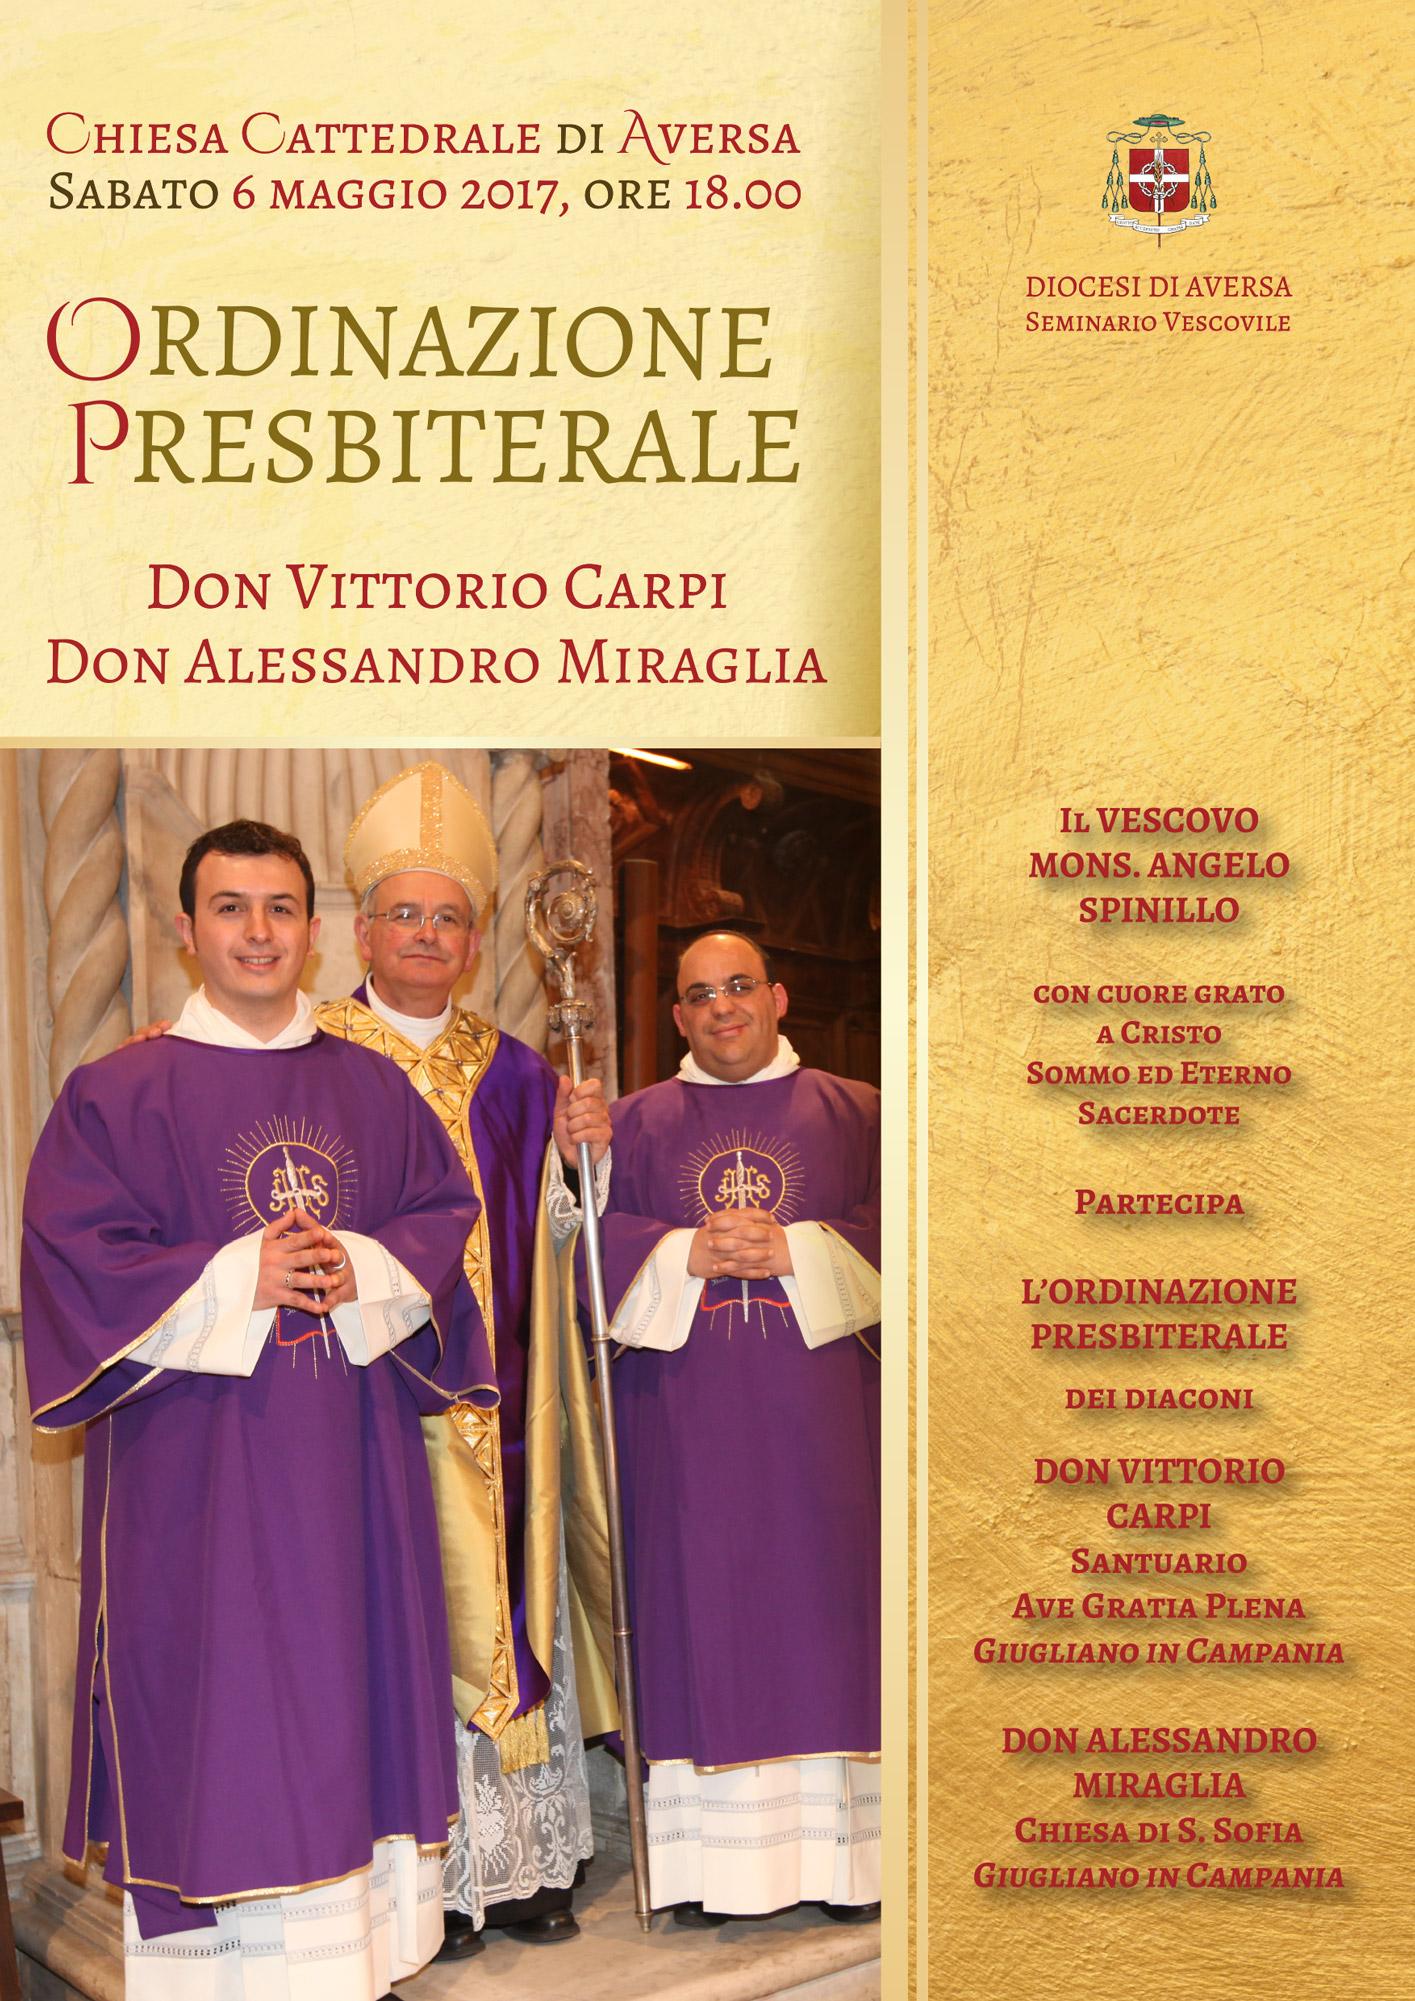 Ordinazione-Presbiterale-2017-Locandina